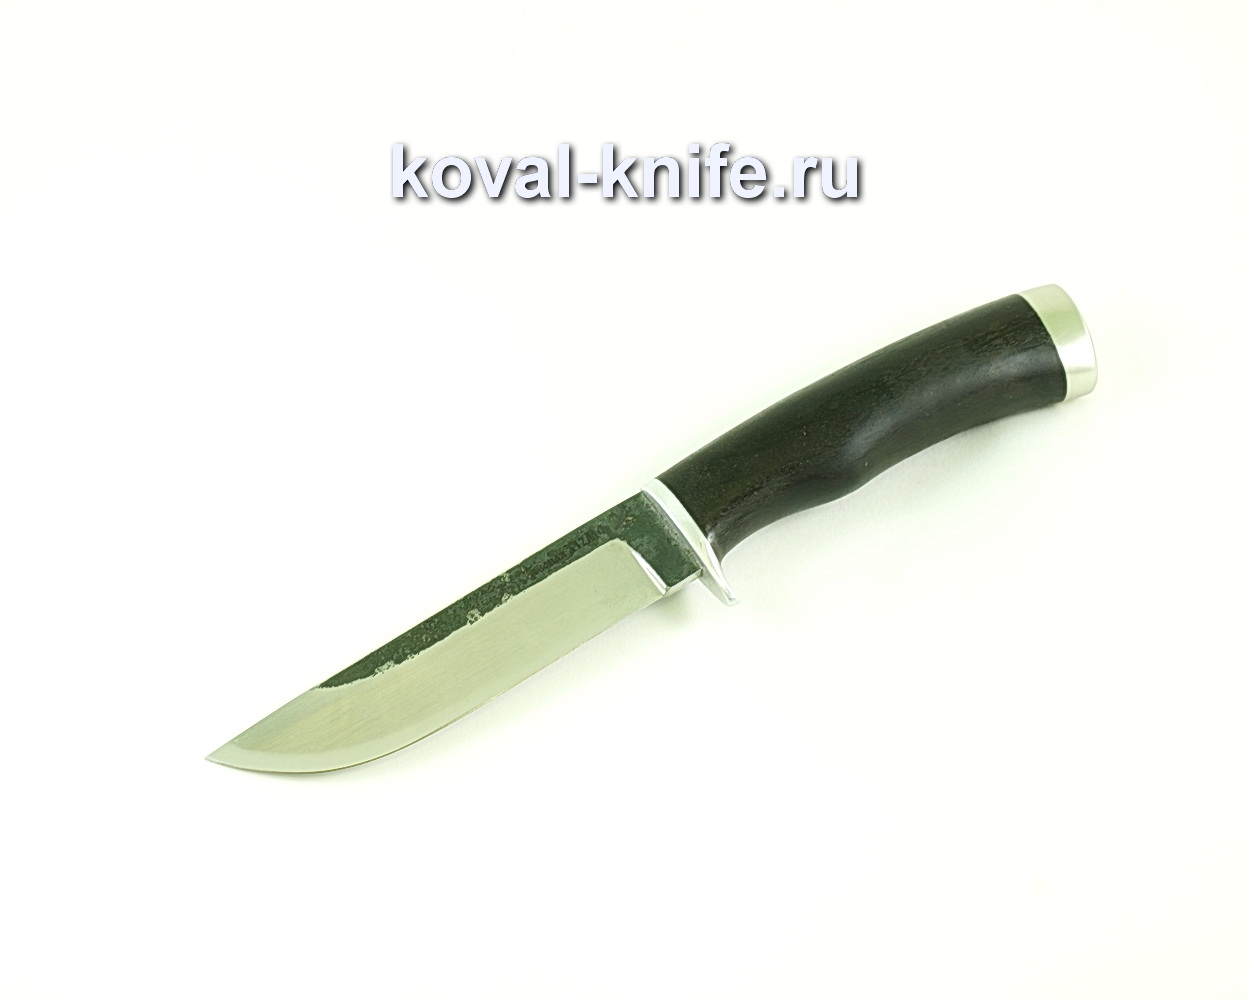 Нож Белка (сталь х12мф), рукоять граб, литье A081